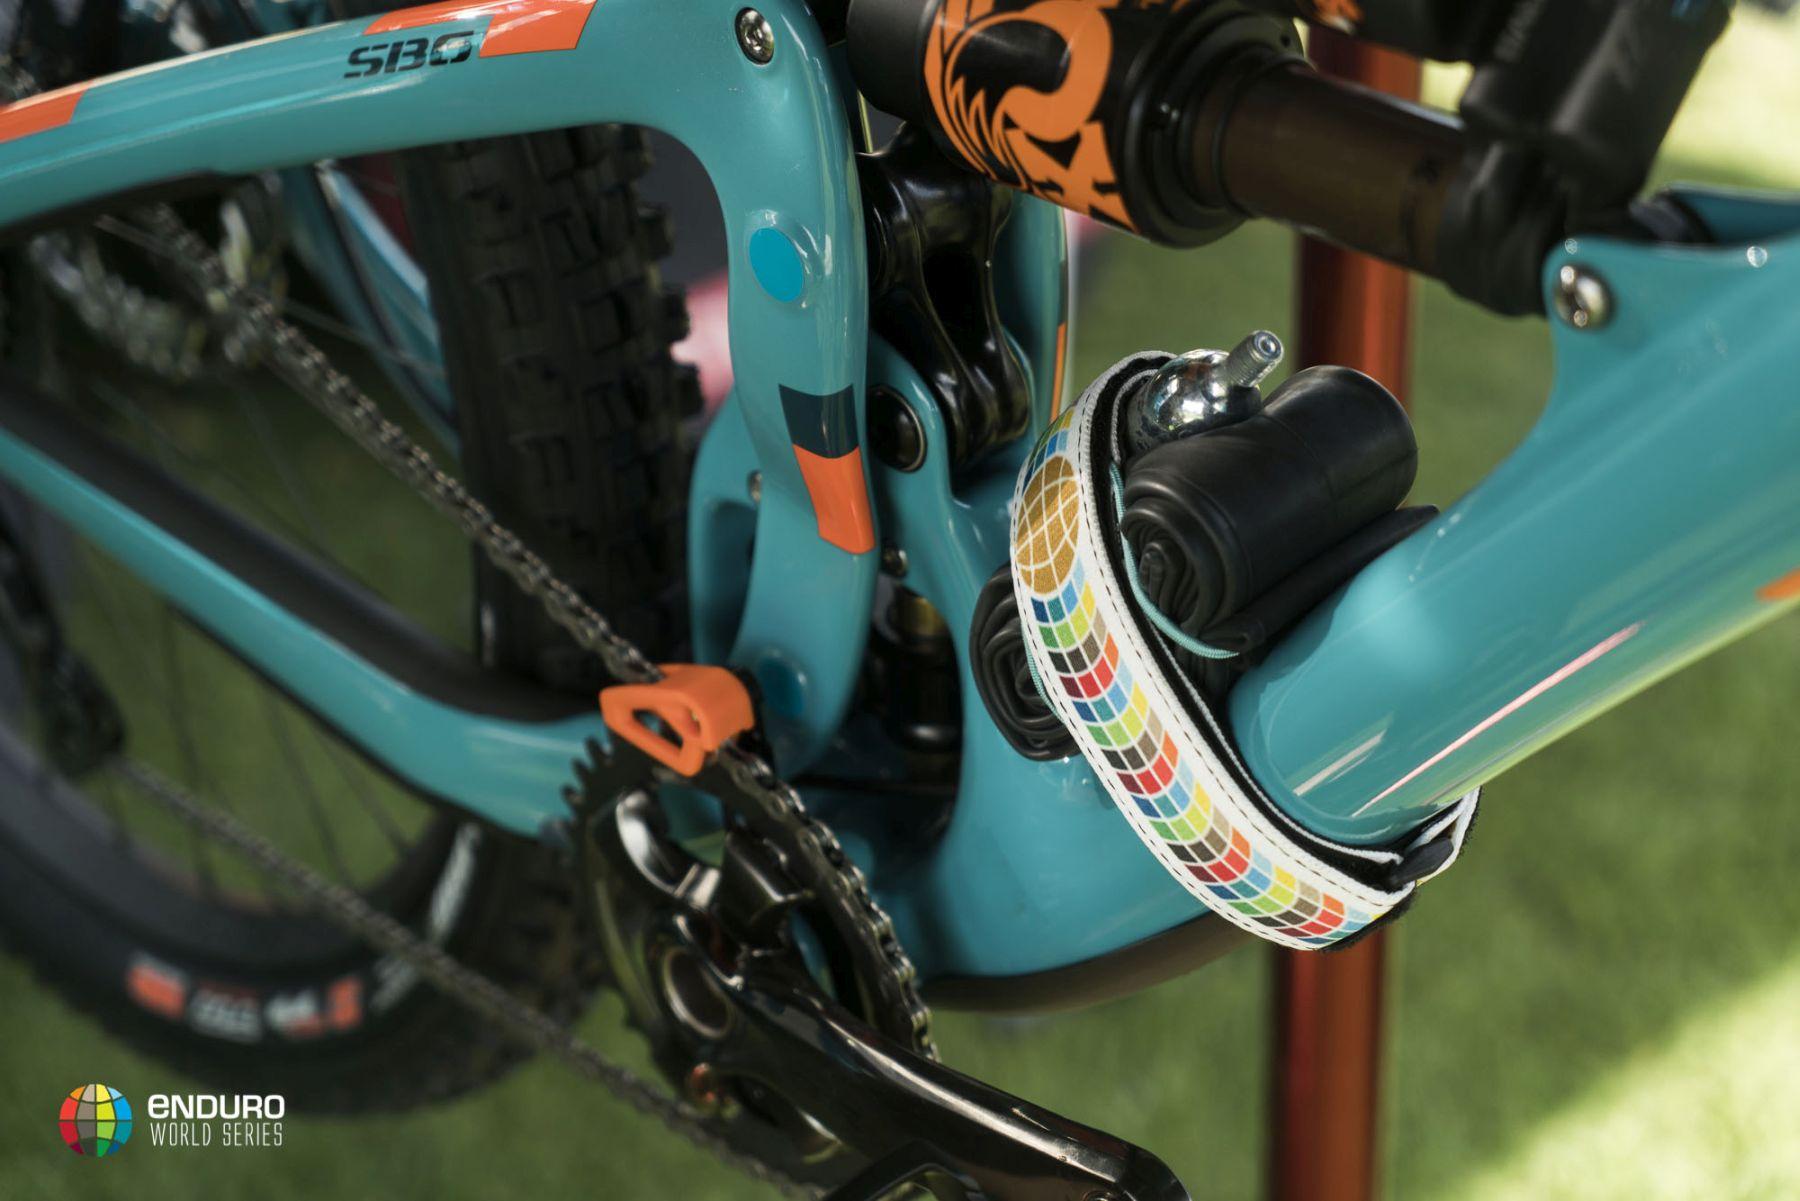 Detalles de la bici de Richie Rude